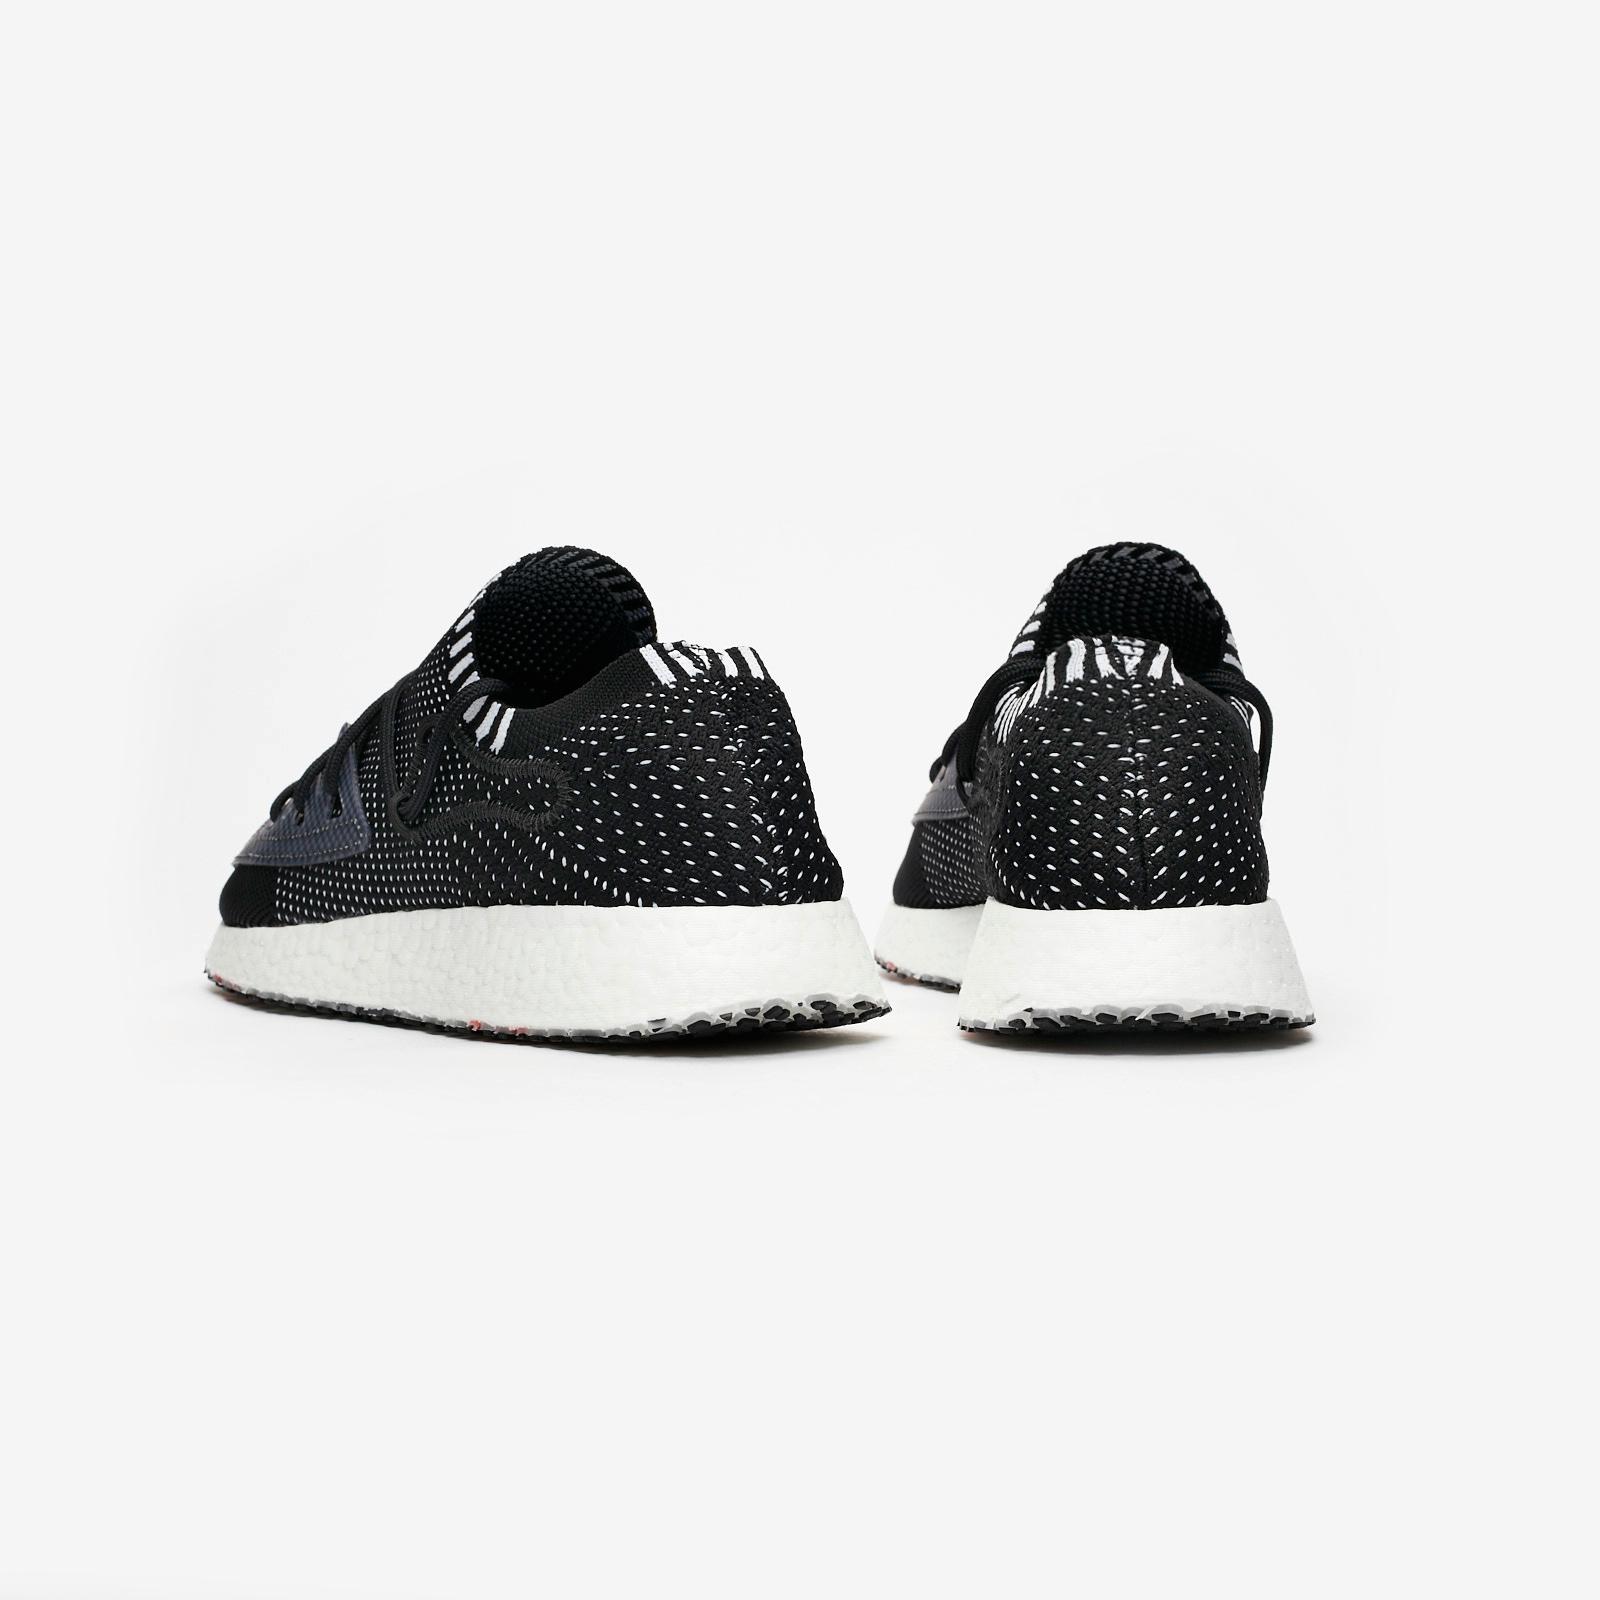 adidas Y 3 Ratio Racer F97404 Shoes Black